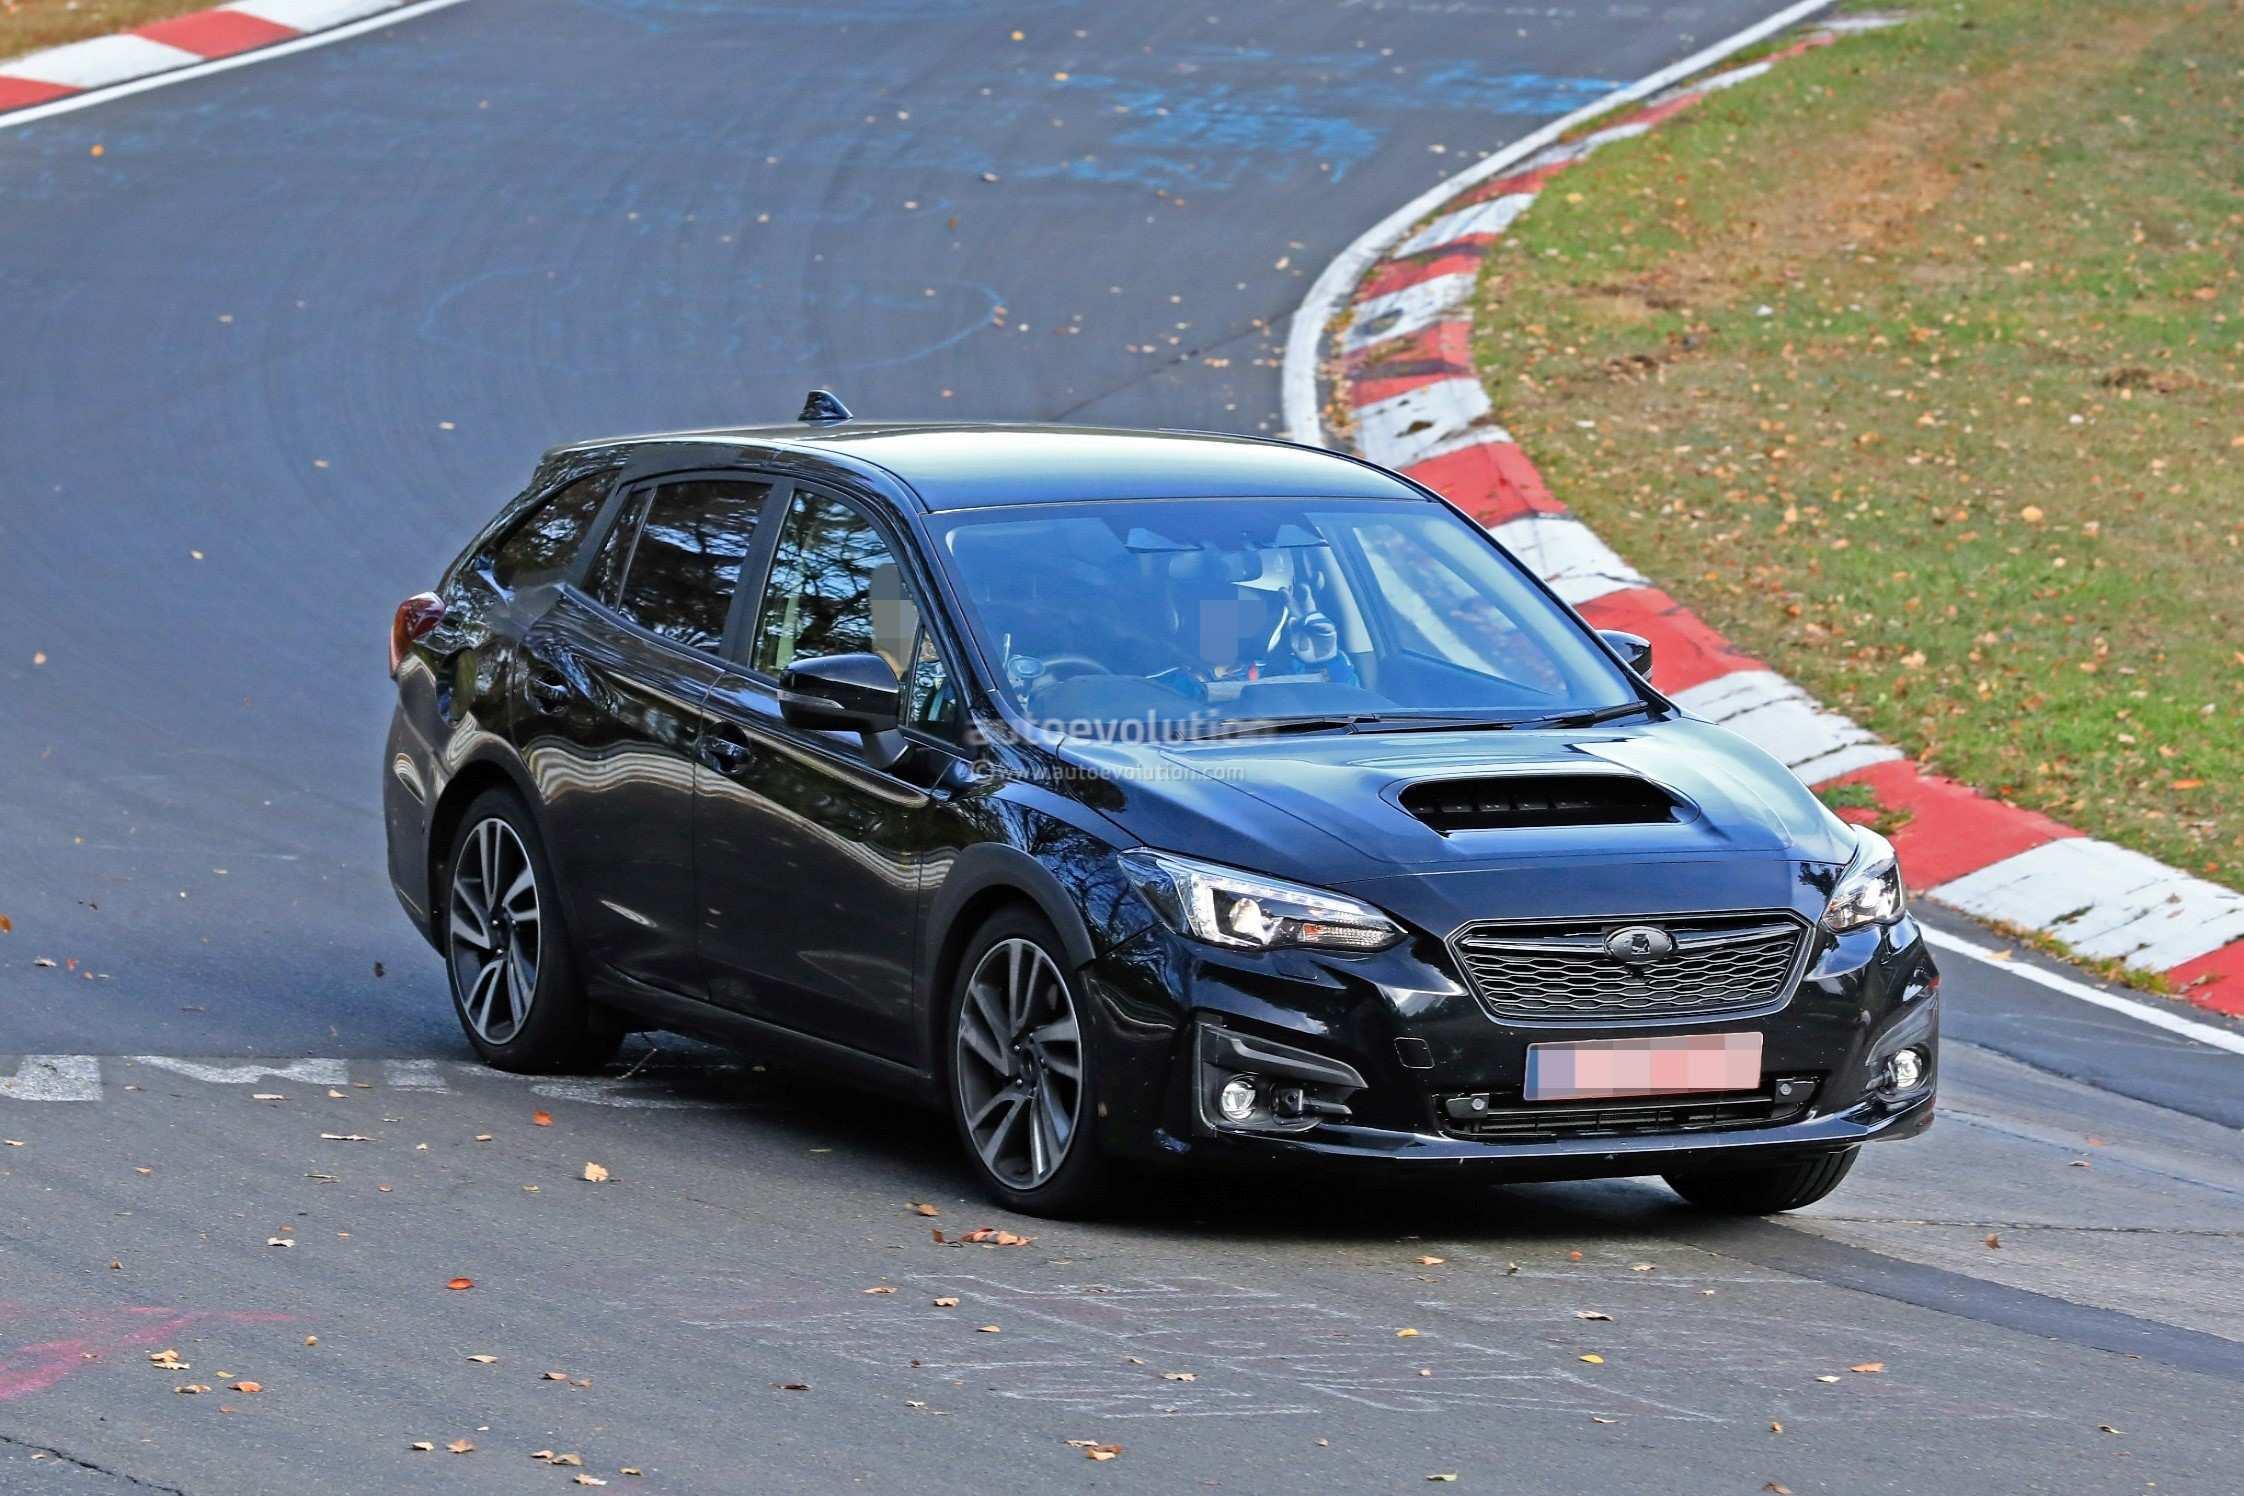 83 Best Review Subaru Japan 2020 Exterior and Interior with Subaru Japan 2020